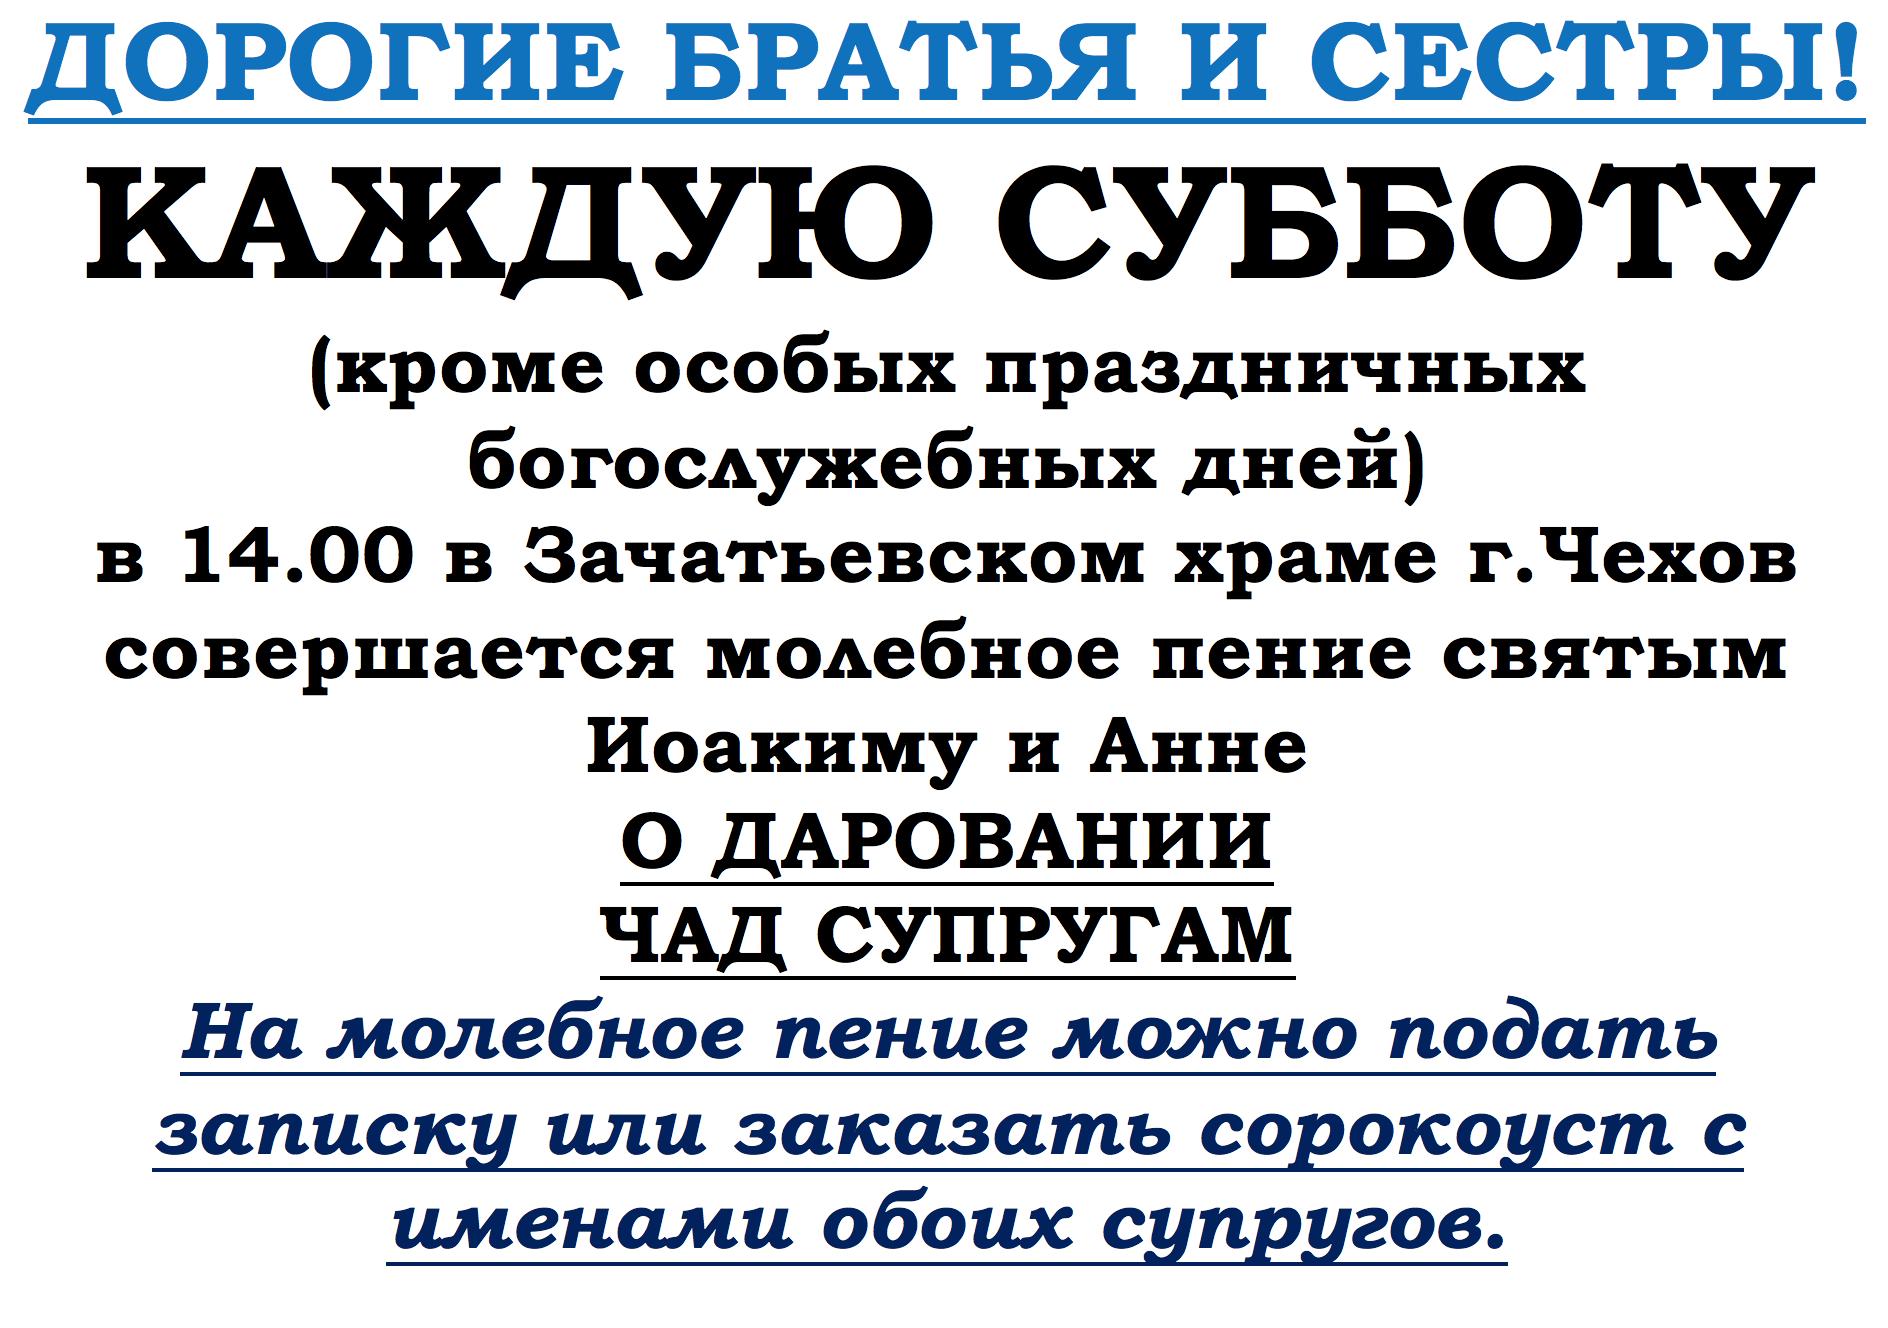 snimok_ekrana_2018-04-30_v_21.21.54.png